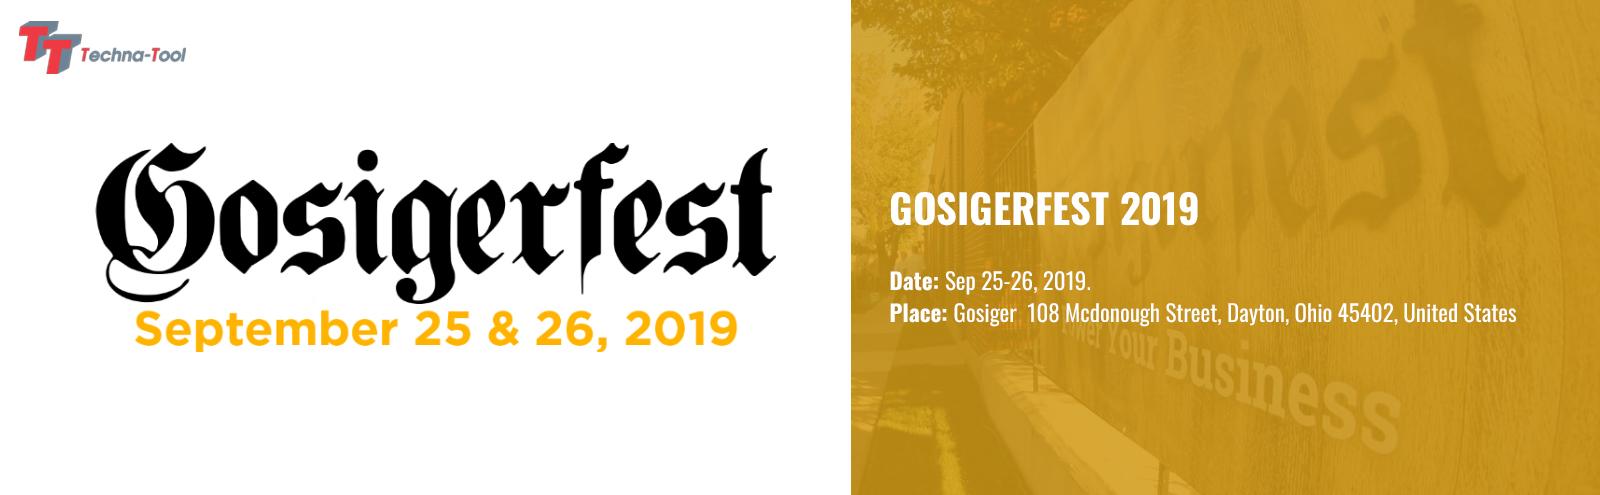 GOSIGERFEST 2019